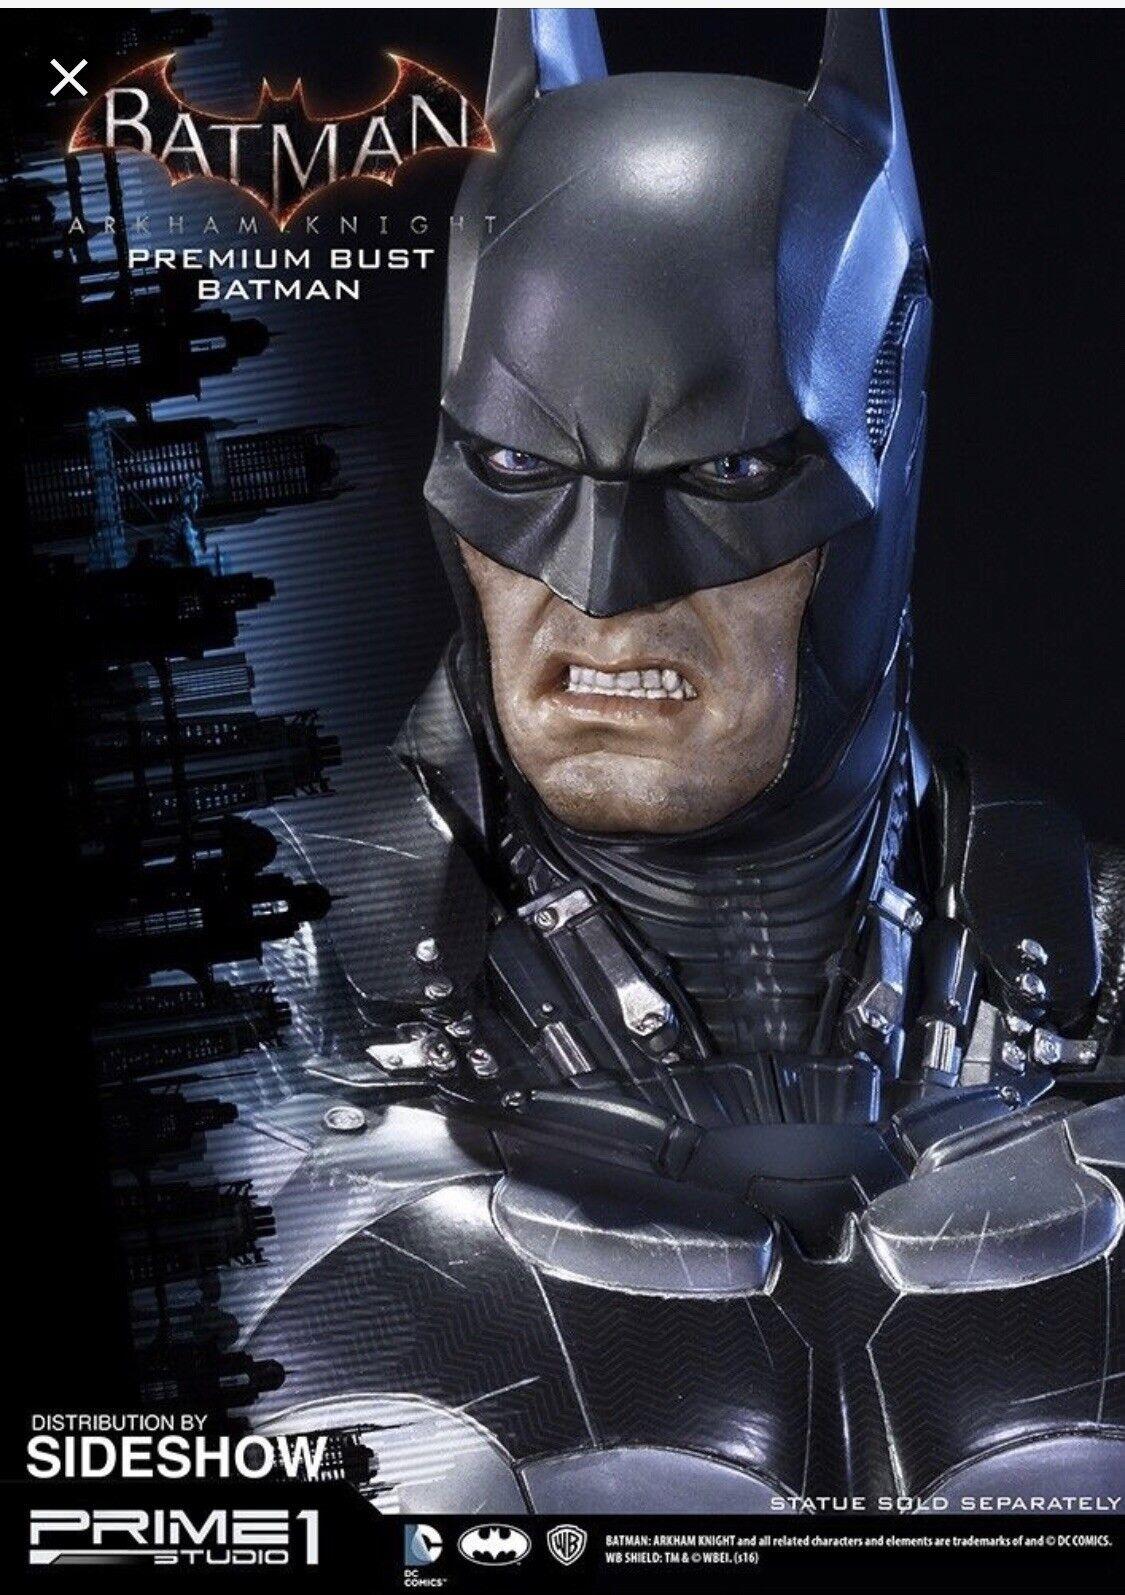 PRIME 1 STUDIO ARKHAM KNIGHT BATMAN 1 3 BUST BRAND NEW